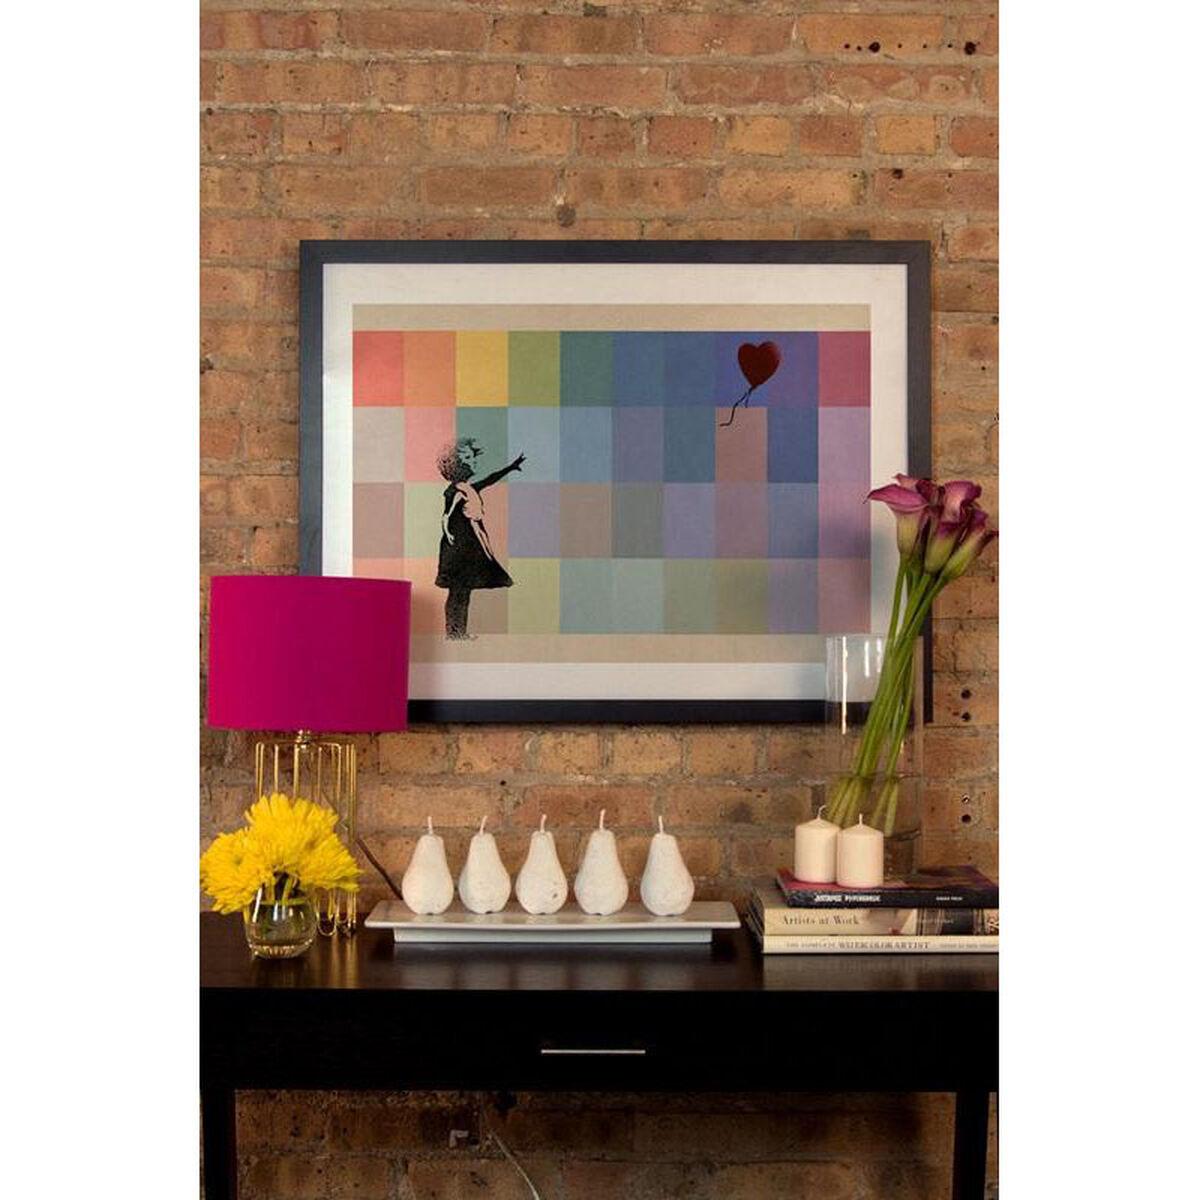 Wall Art Hardwood Frame 2017b 1pfa 32x24 Fm01 Bizchaircom